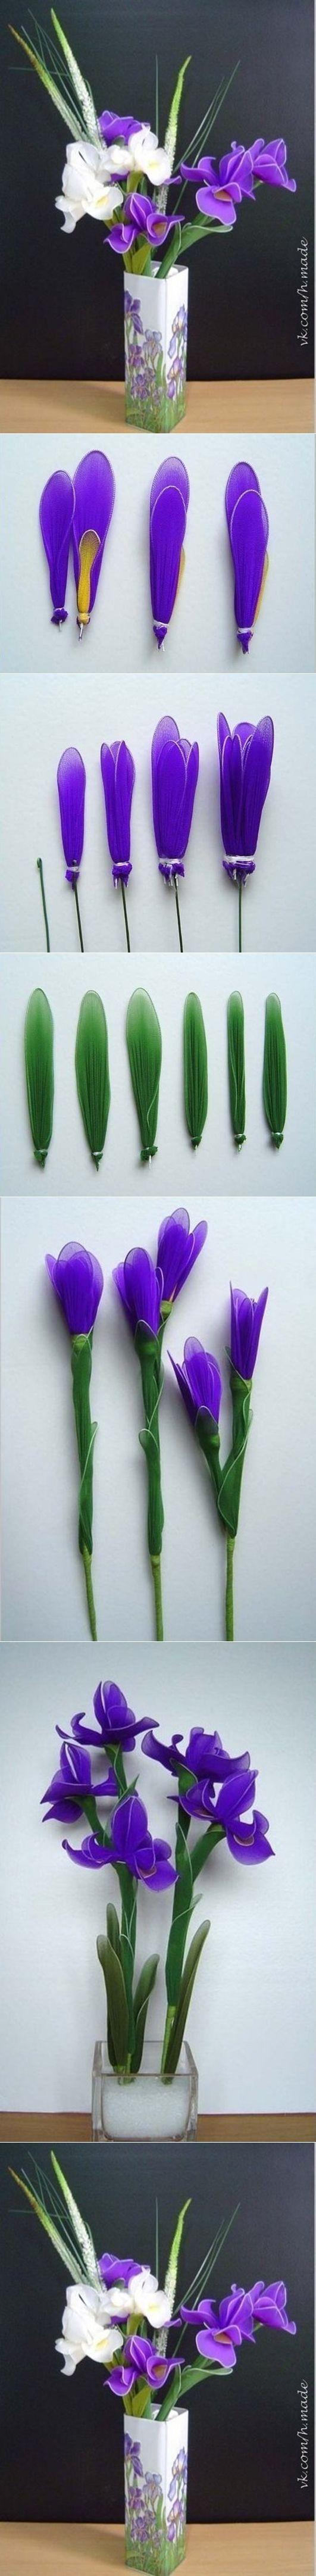 how to DIY Easy Wrapped Nylon Flowers | www.FabArtDIY.com LIKE Us on Facebook ==> https://www.facebook.com/FabArtDIY